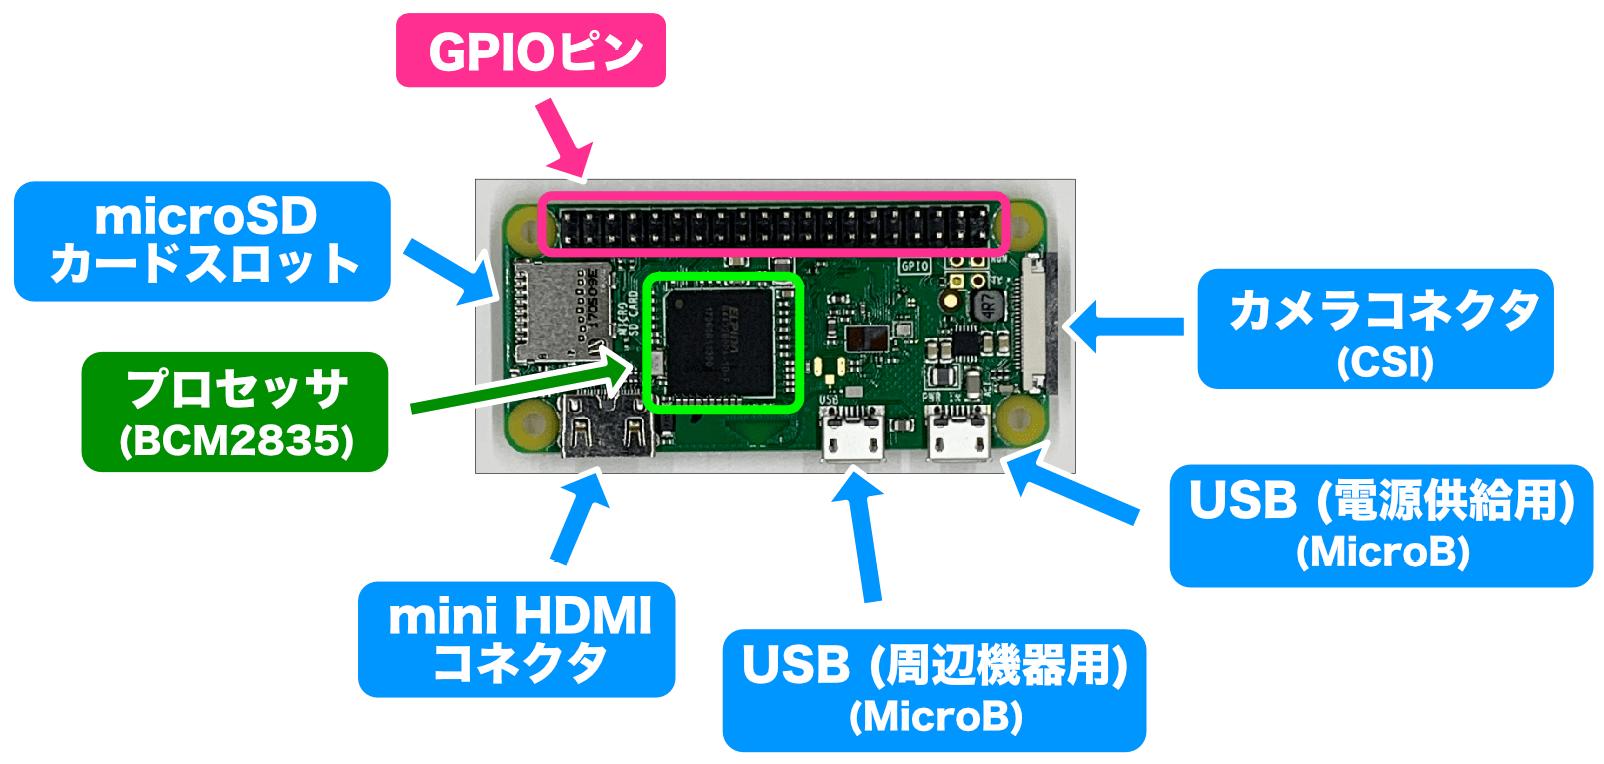 Raspberry Pi Zeroおもて面